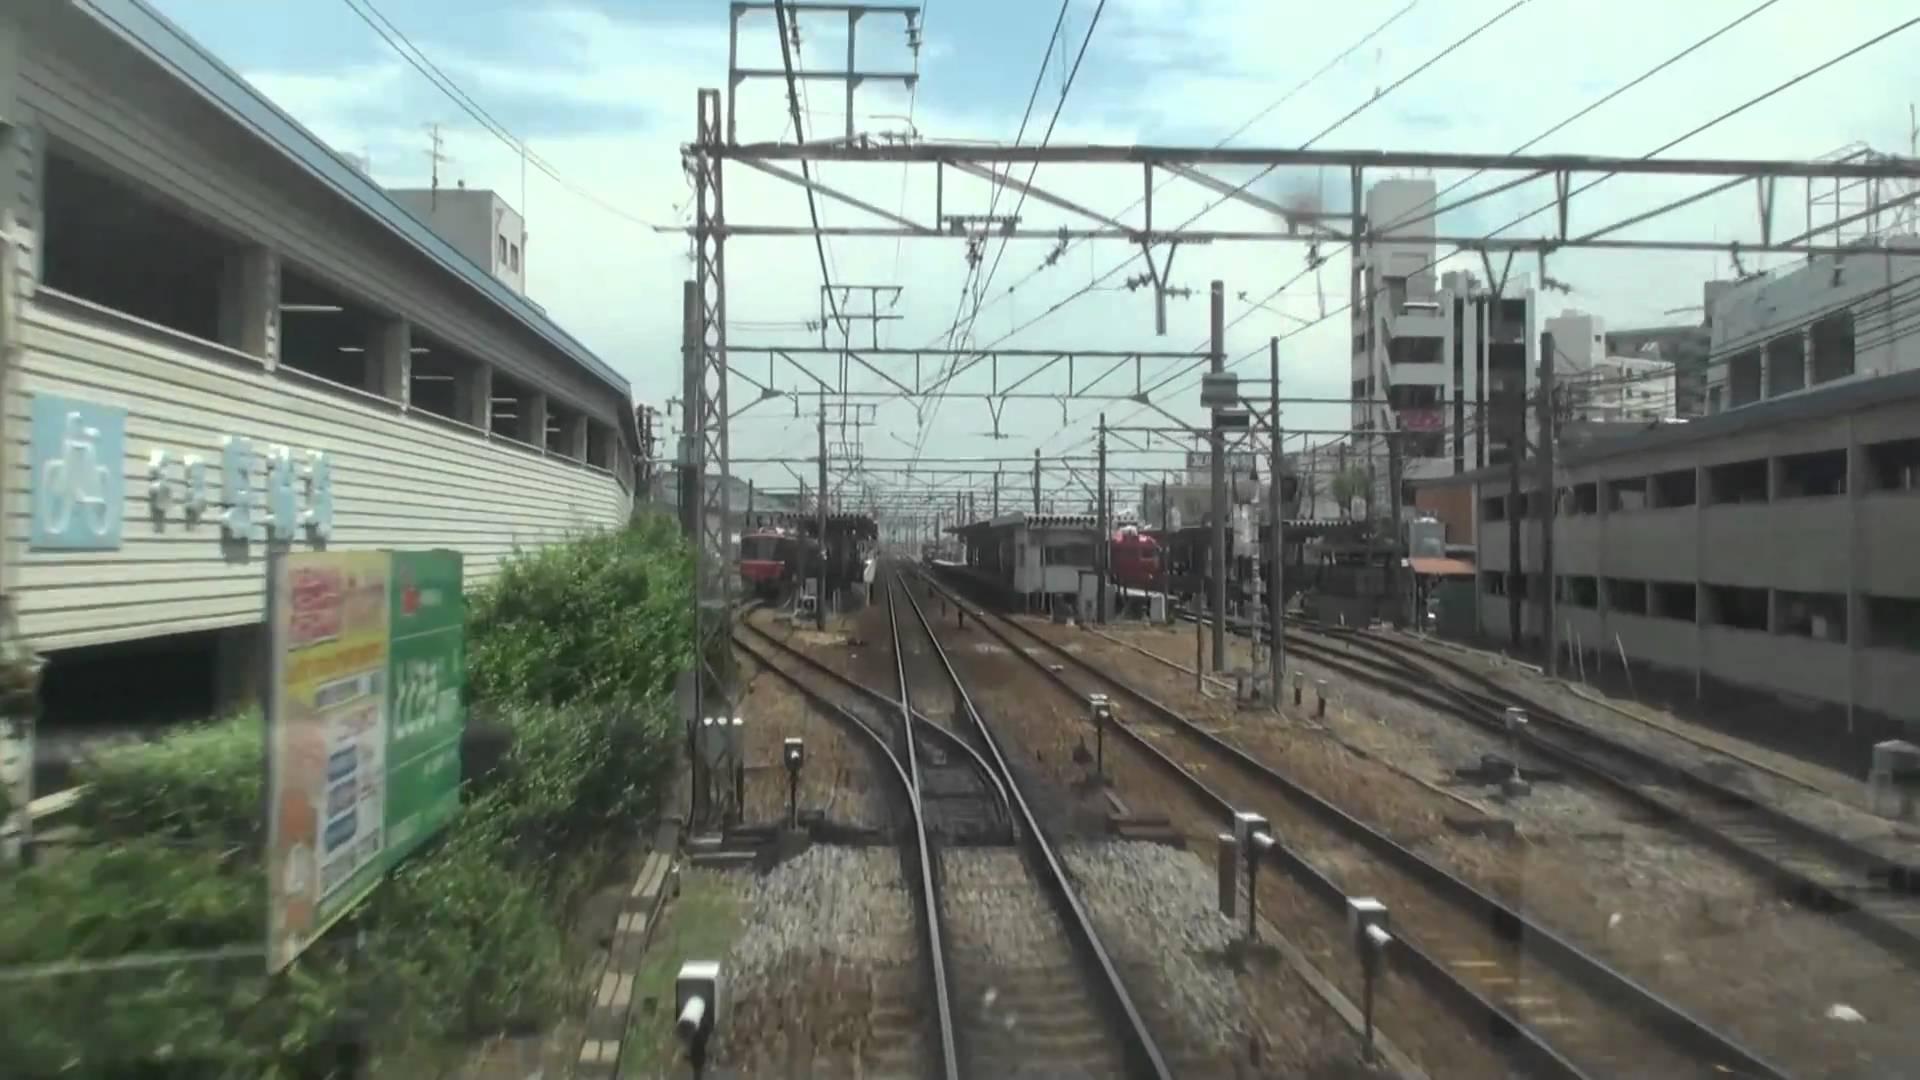 【FHD】2009-06 パノラマスーパー前面展望(新鵜沼→豊橋)